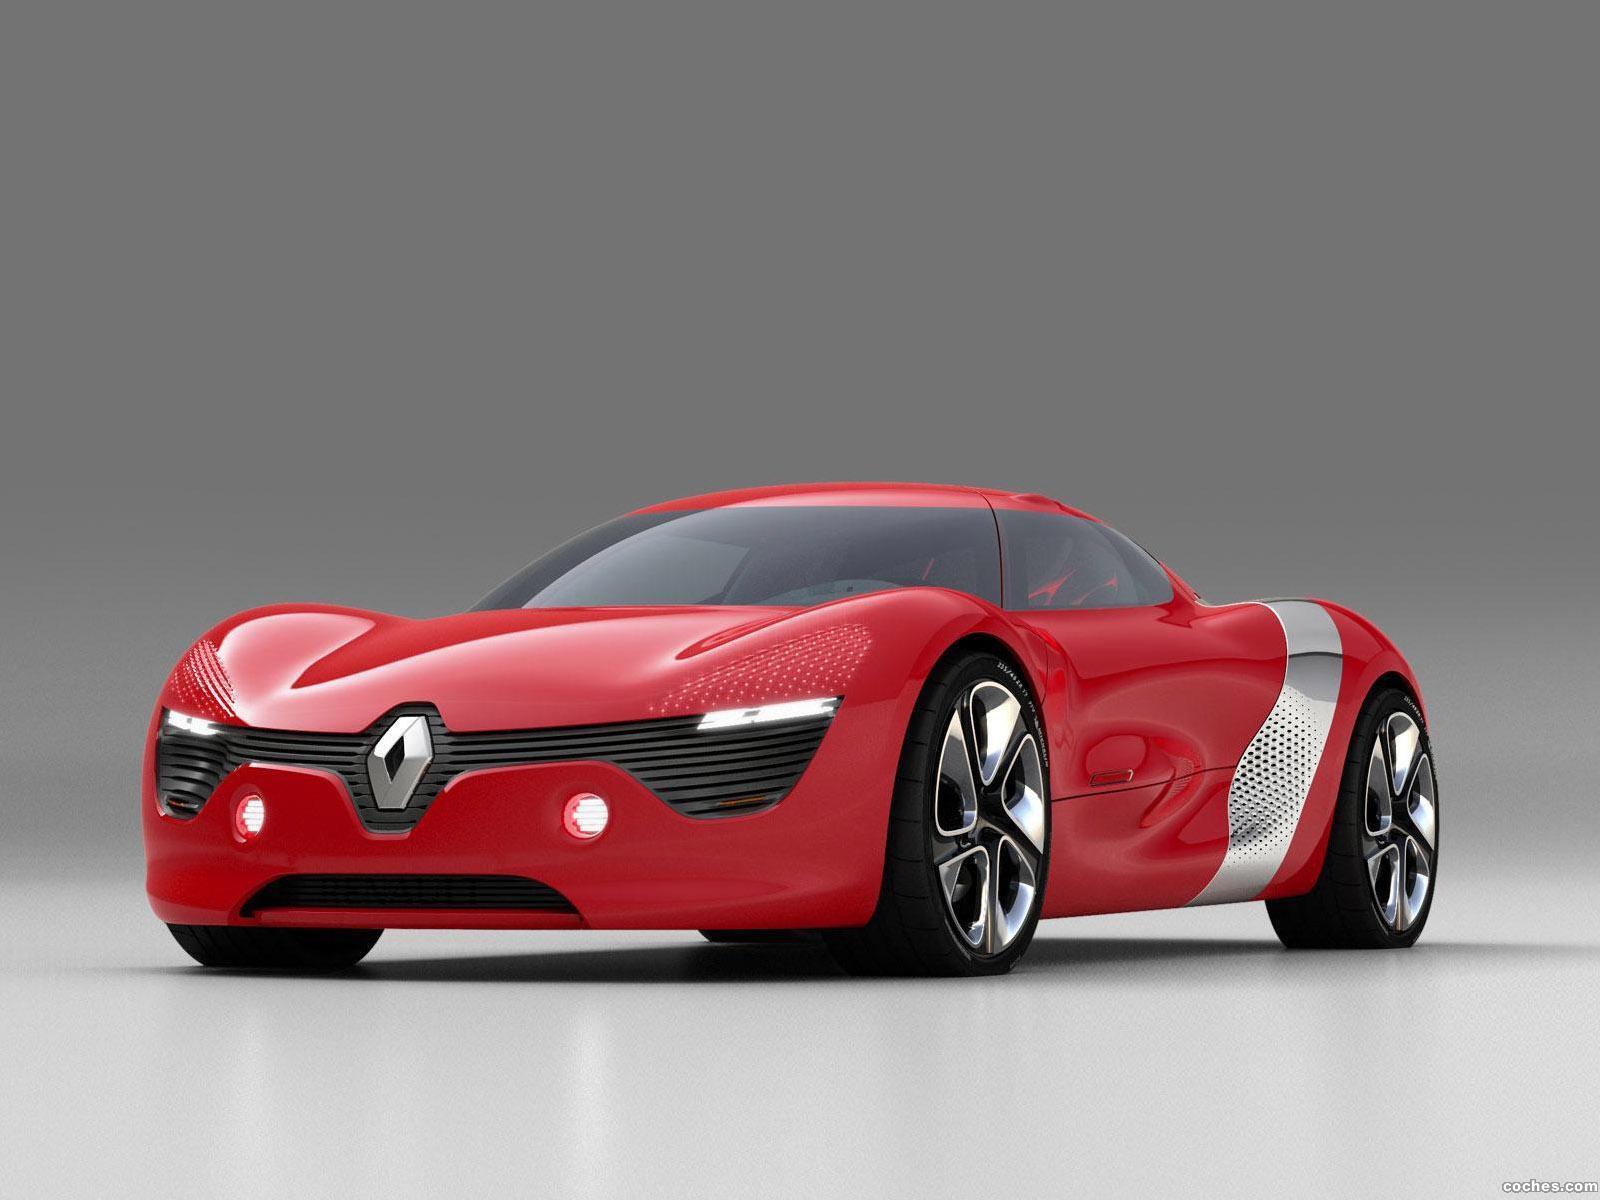 Foto 1 de Renault DeZir Concept 2010